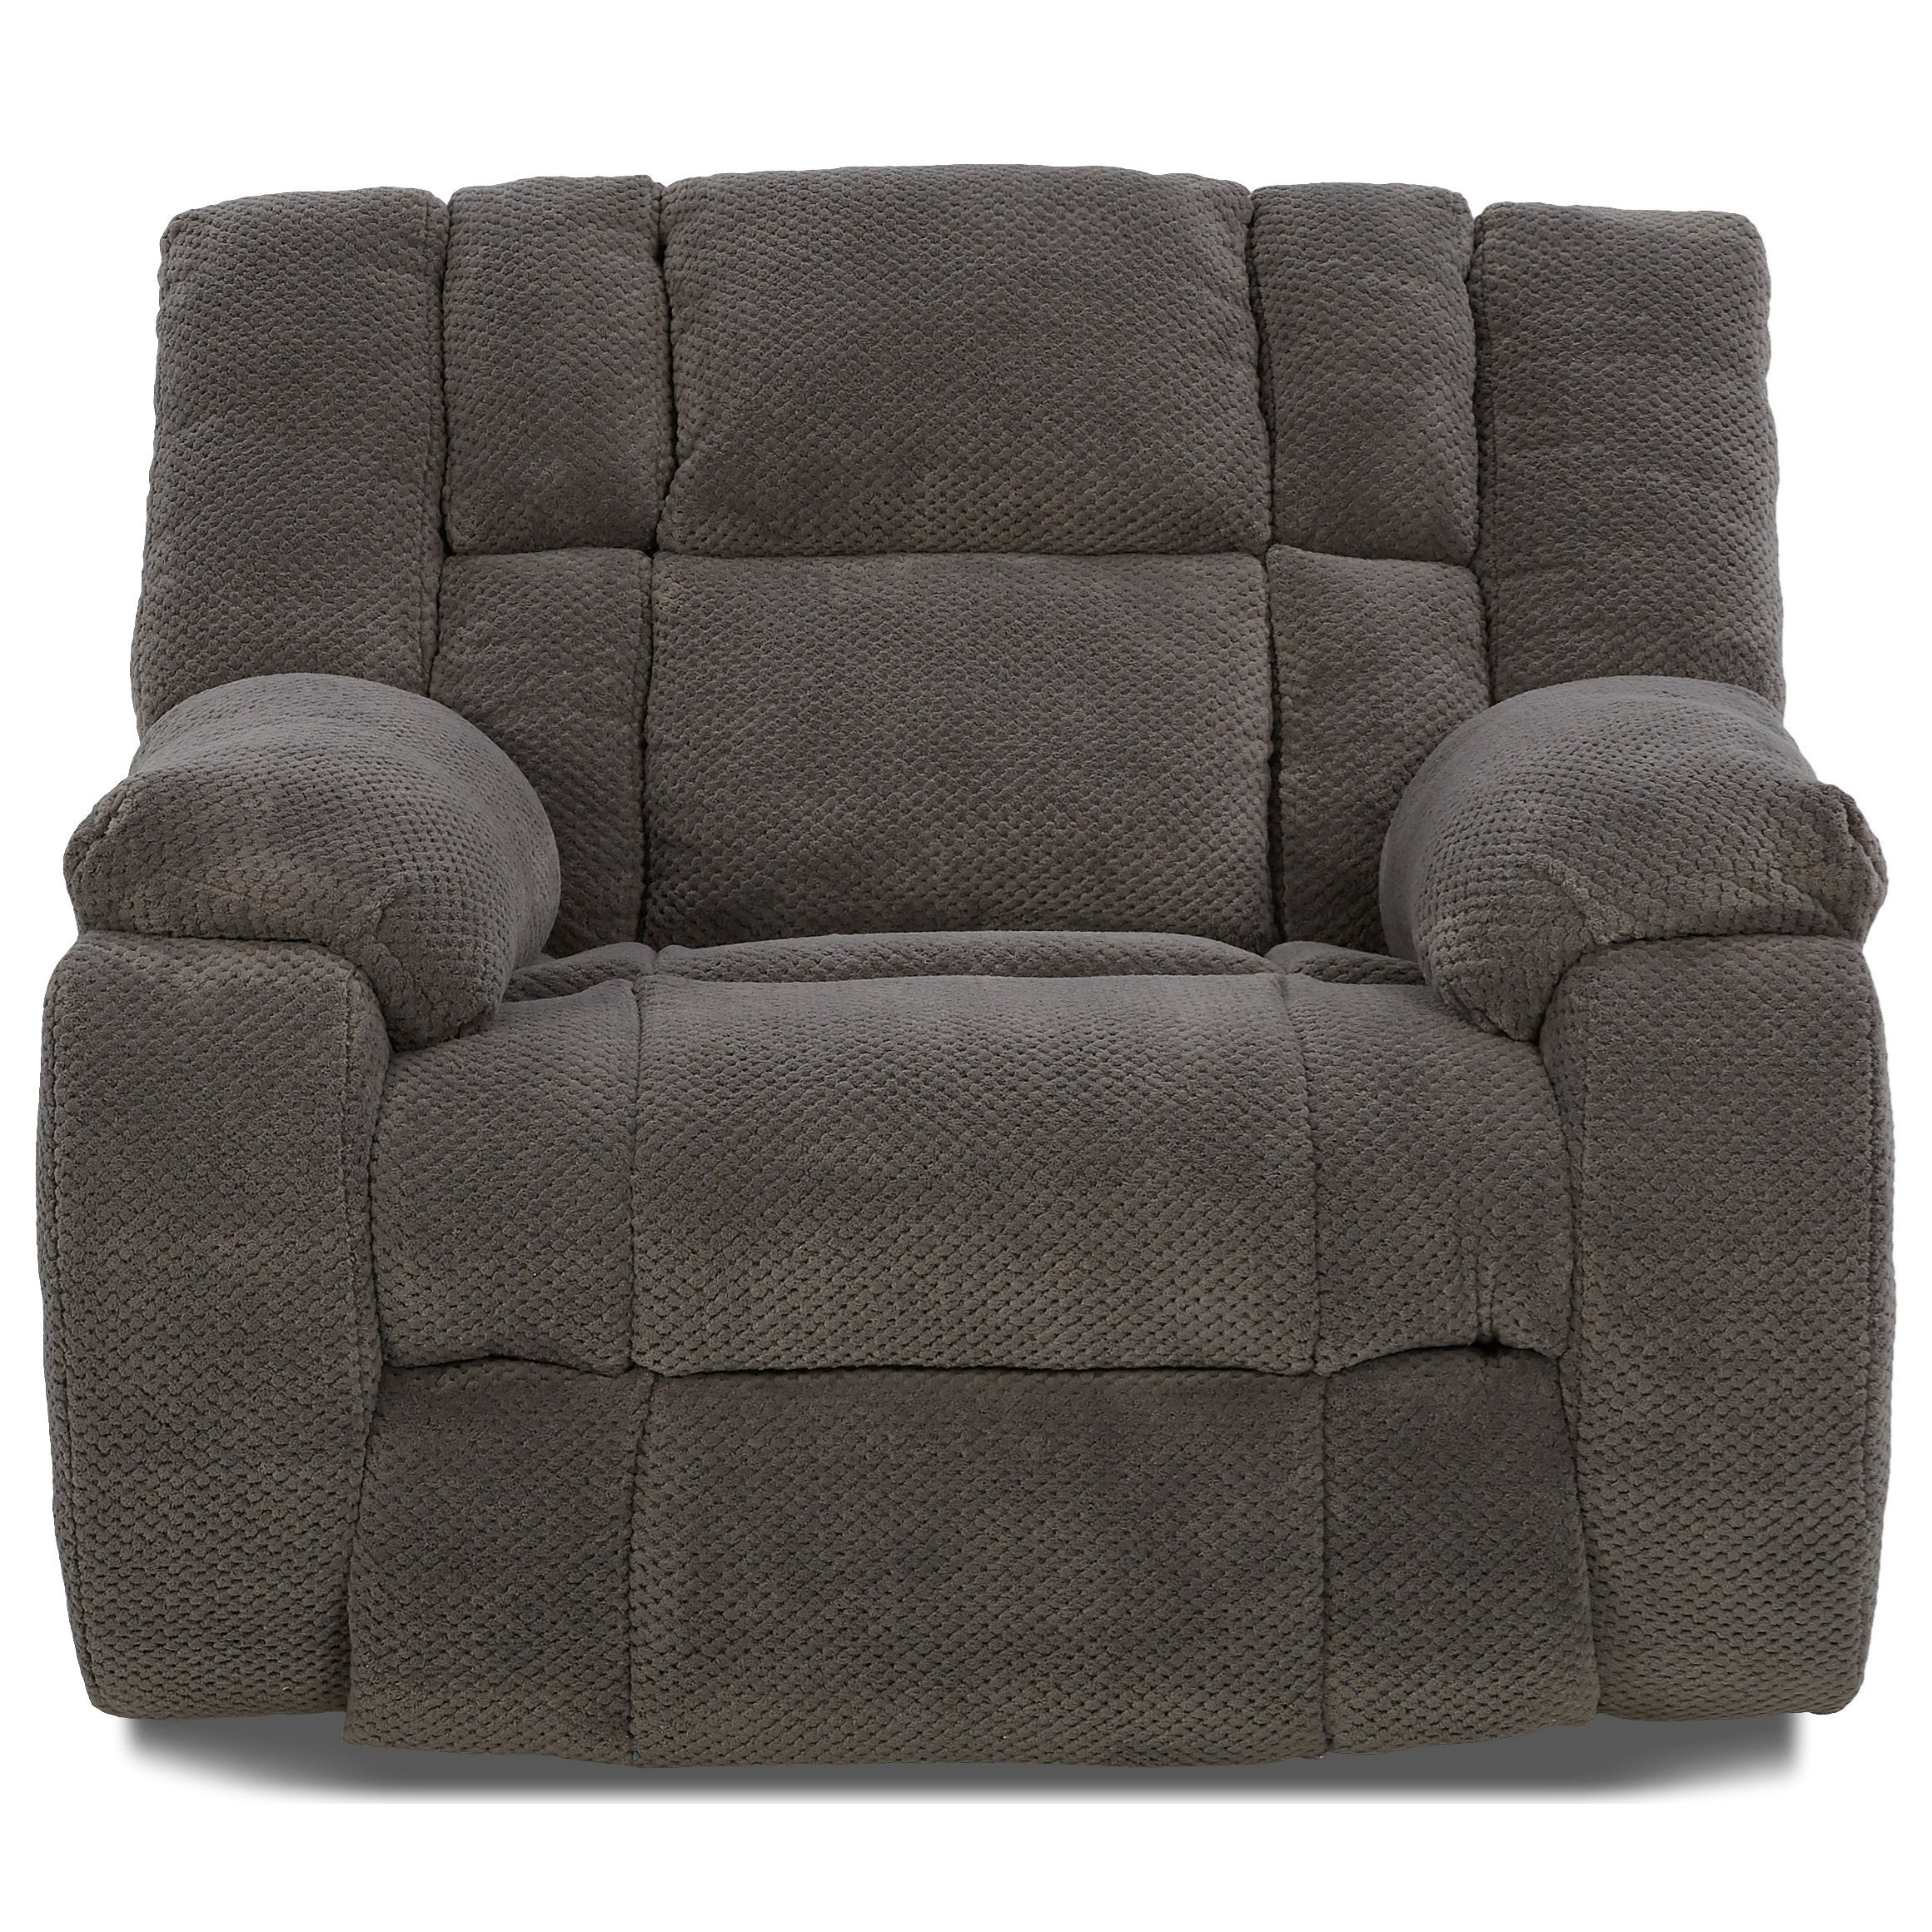 Beau Klaussner Dozer Dozer Casual Reclining Chair U0026 A Half